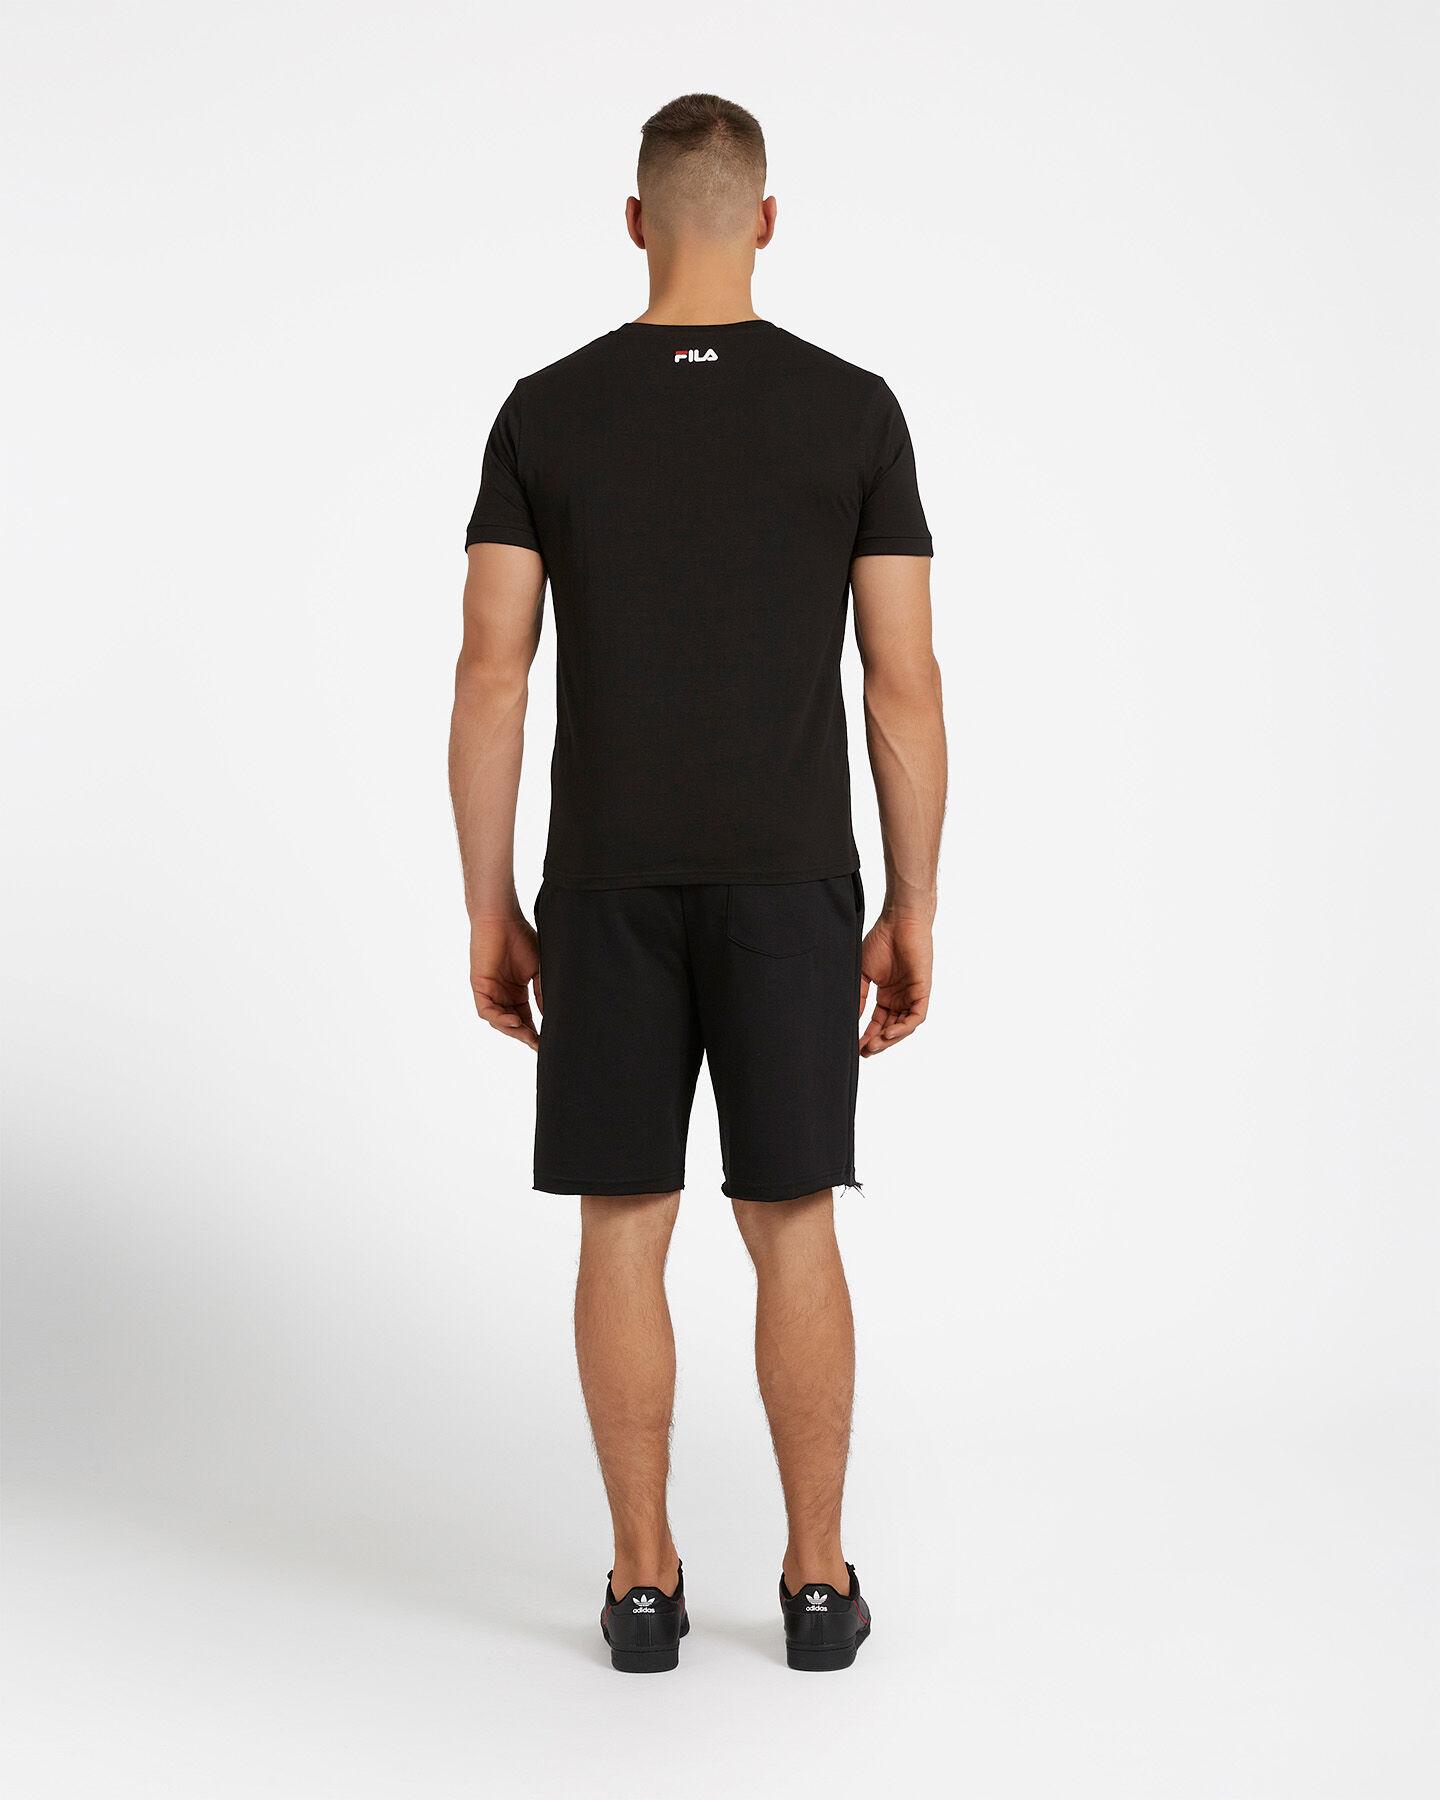 T-Shirt FILA BIG LOGO M S4067077 scatto 2